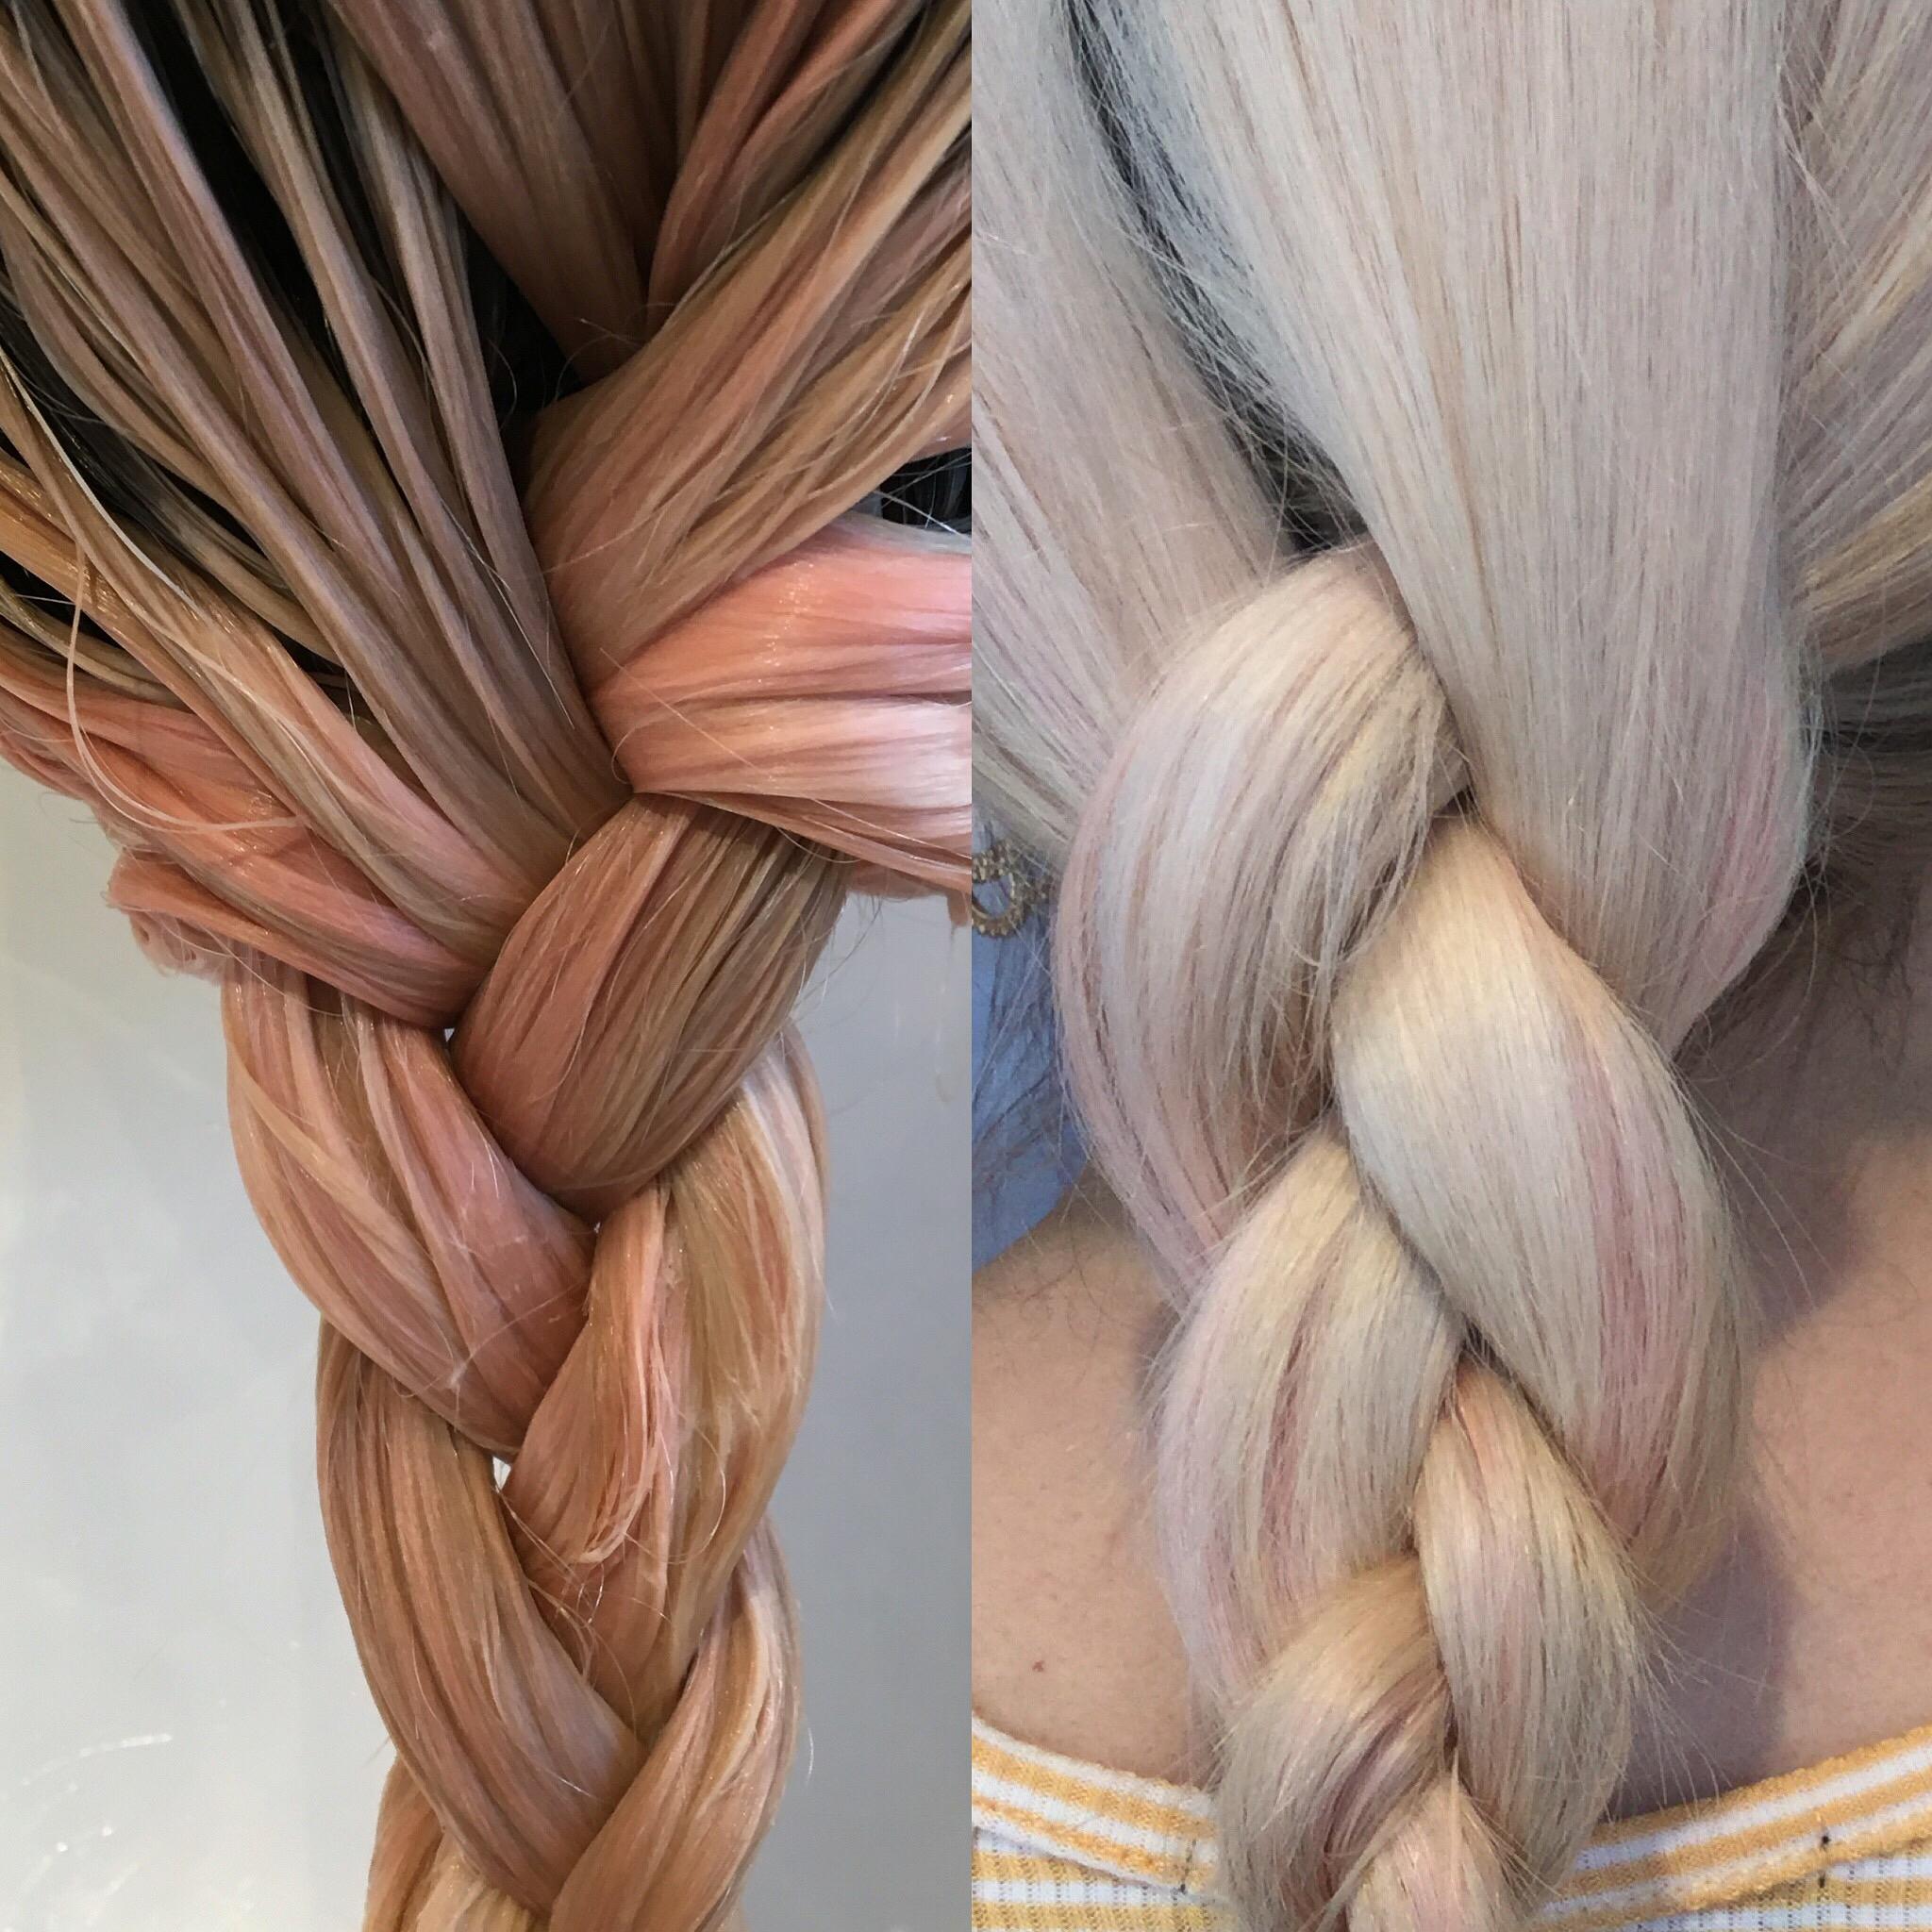 Formula: Ballet Slipper Blonde